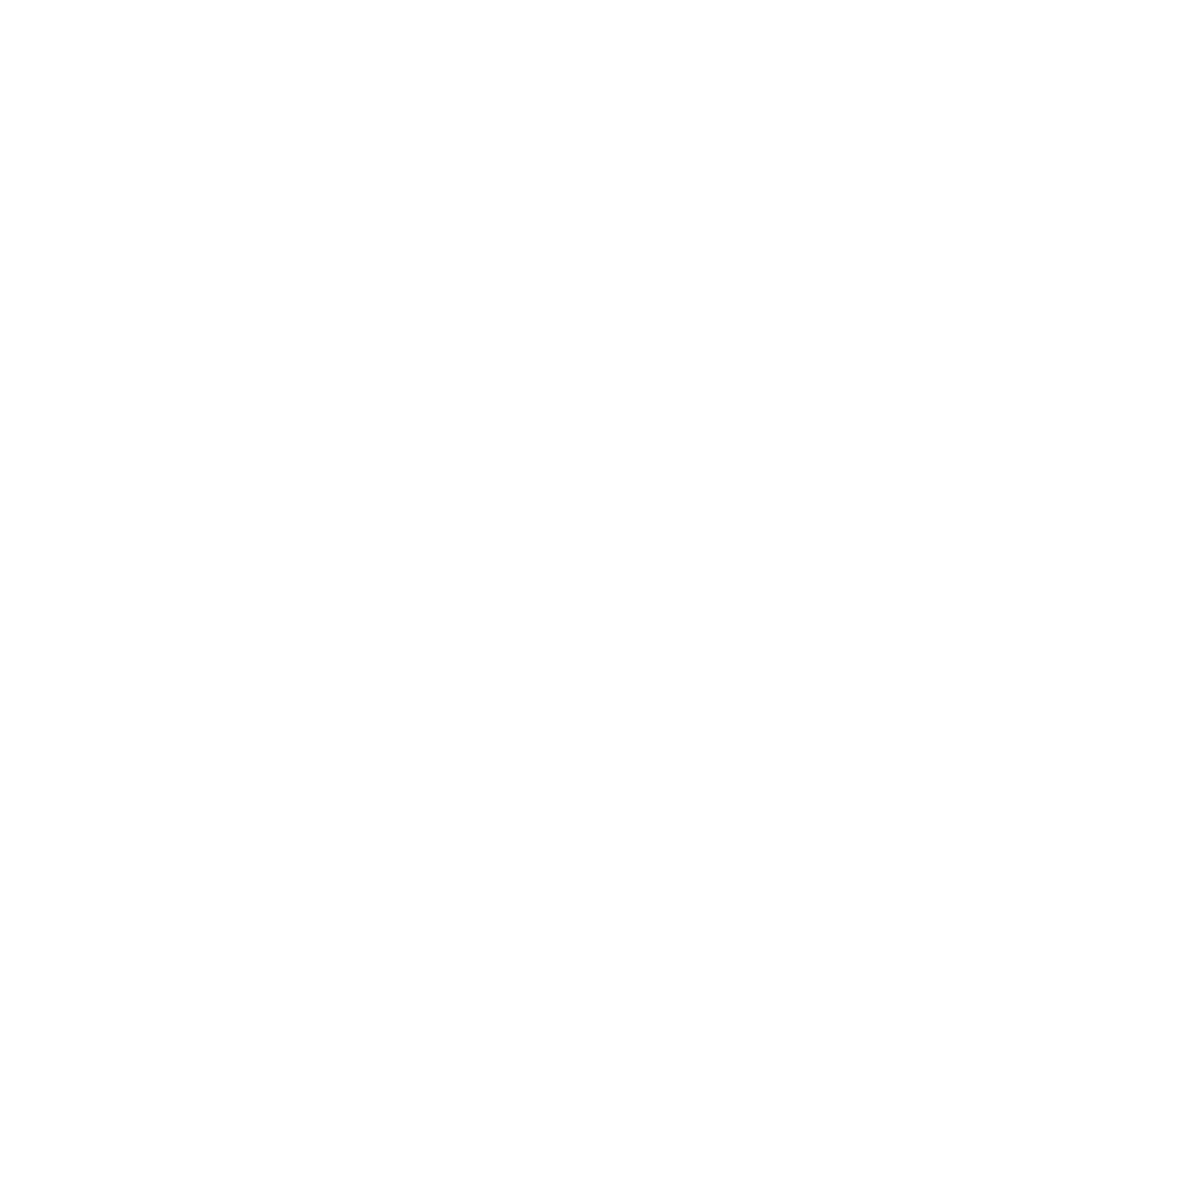 Druzenje banjaluka oglasi Oglasi: Traže